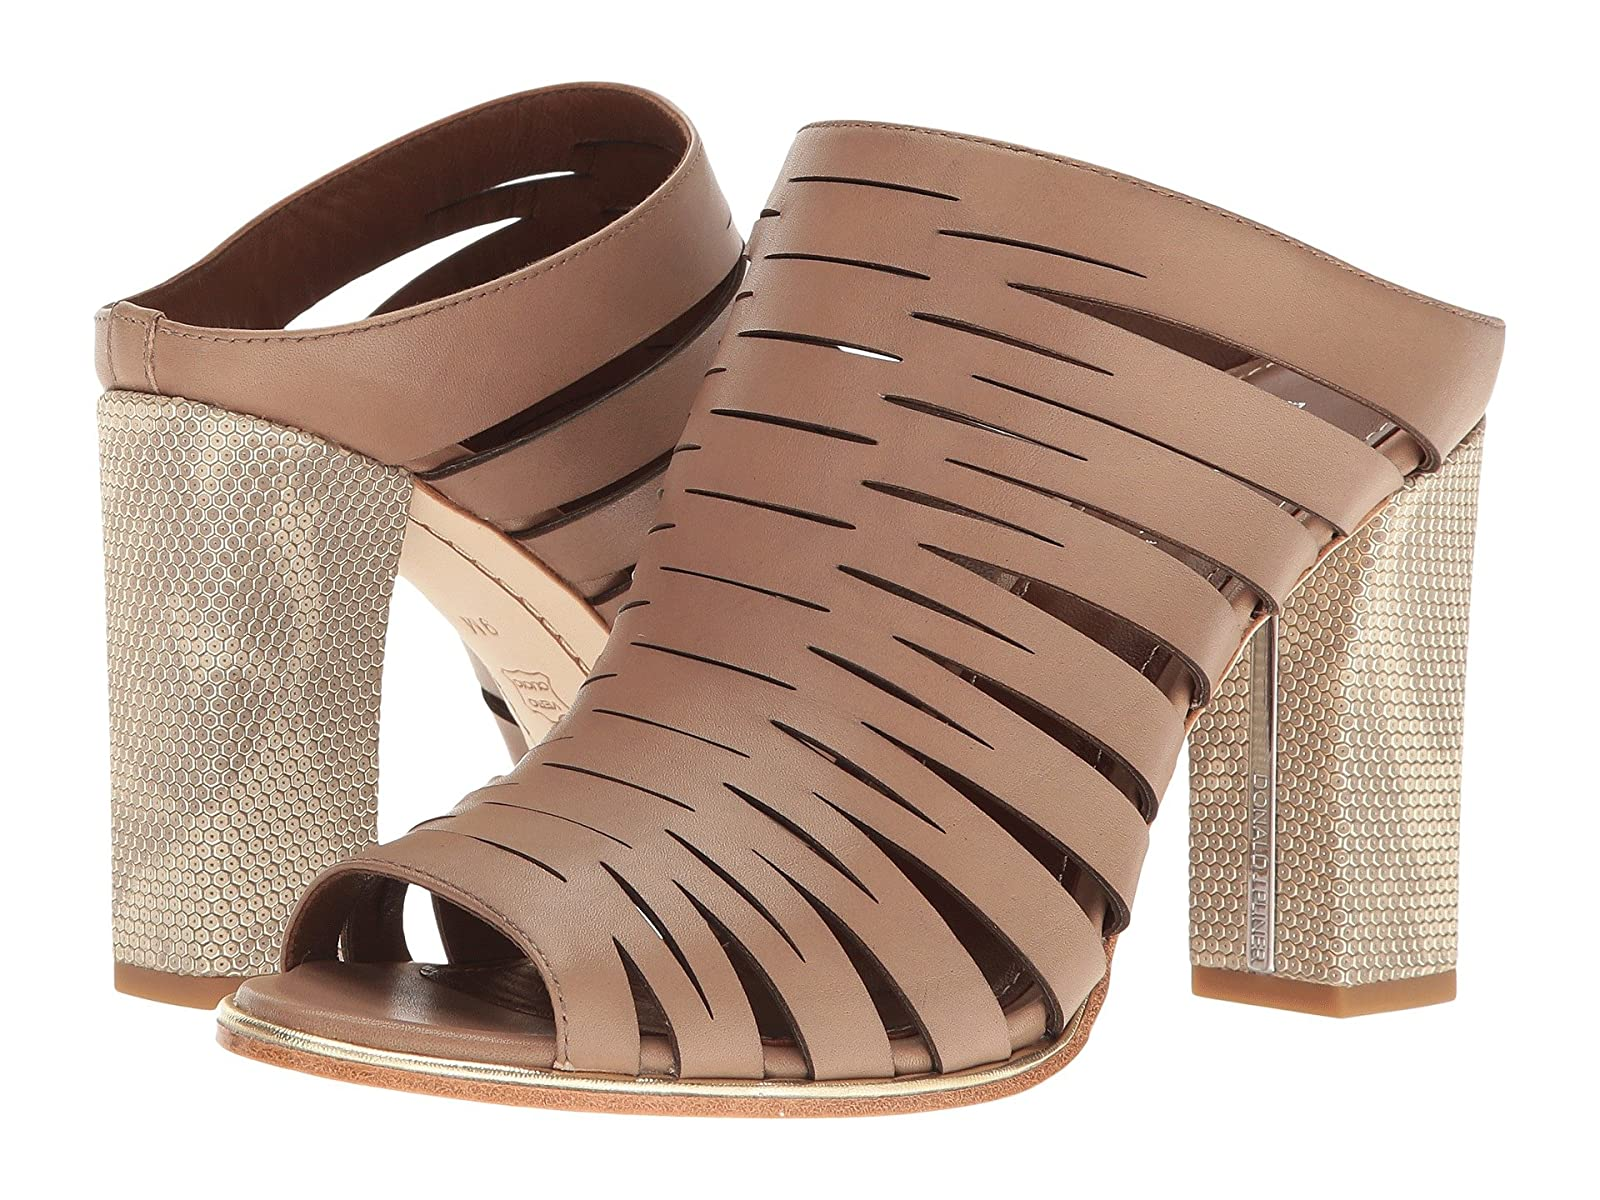 Donald J Pliner KyispCheap and distinctive eye-catching shoes